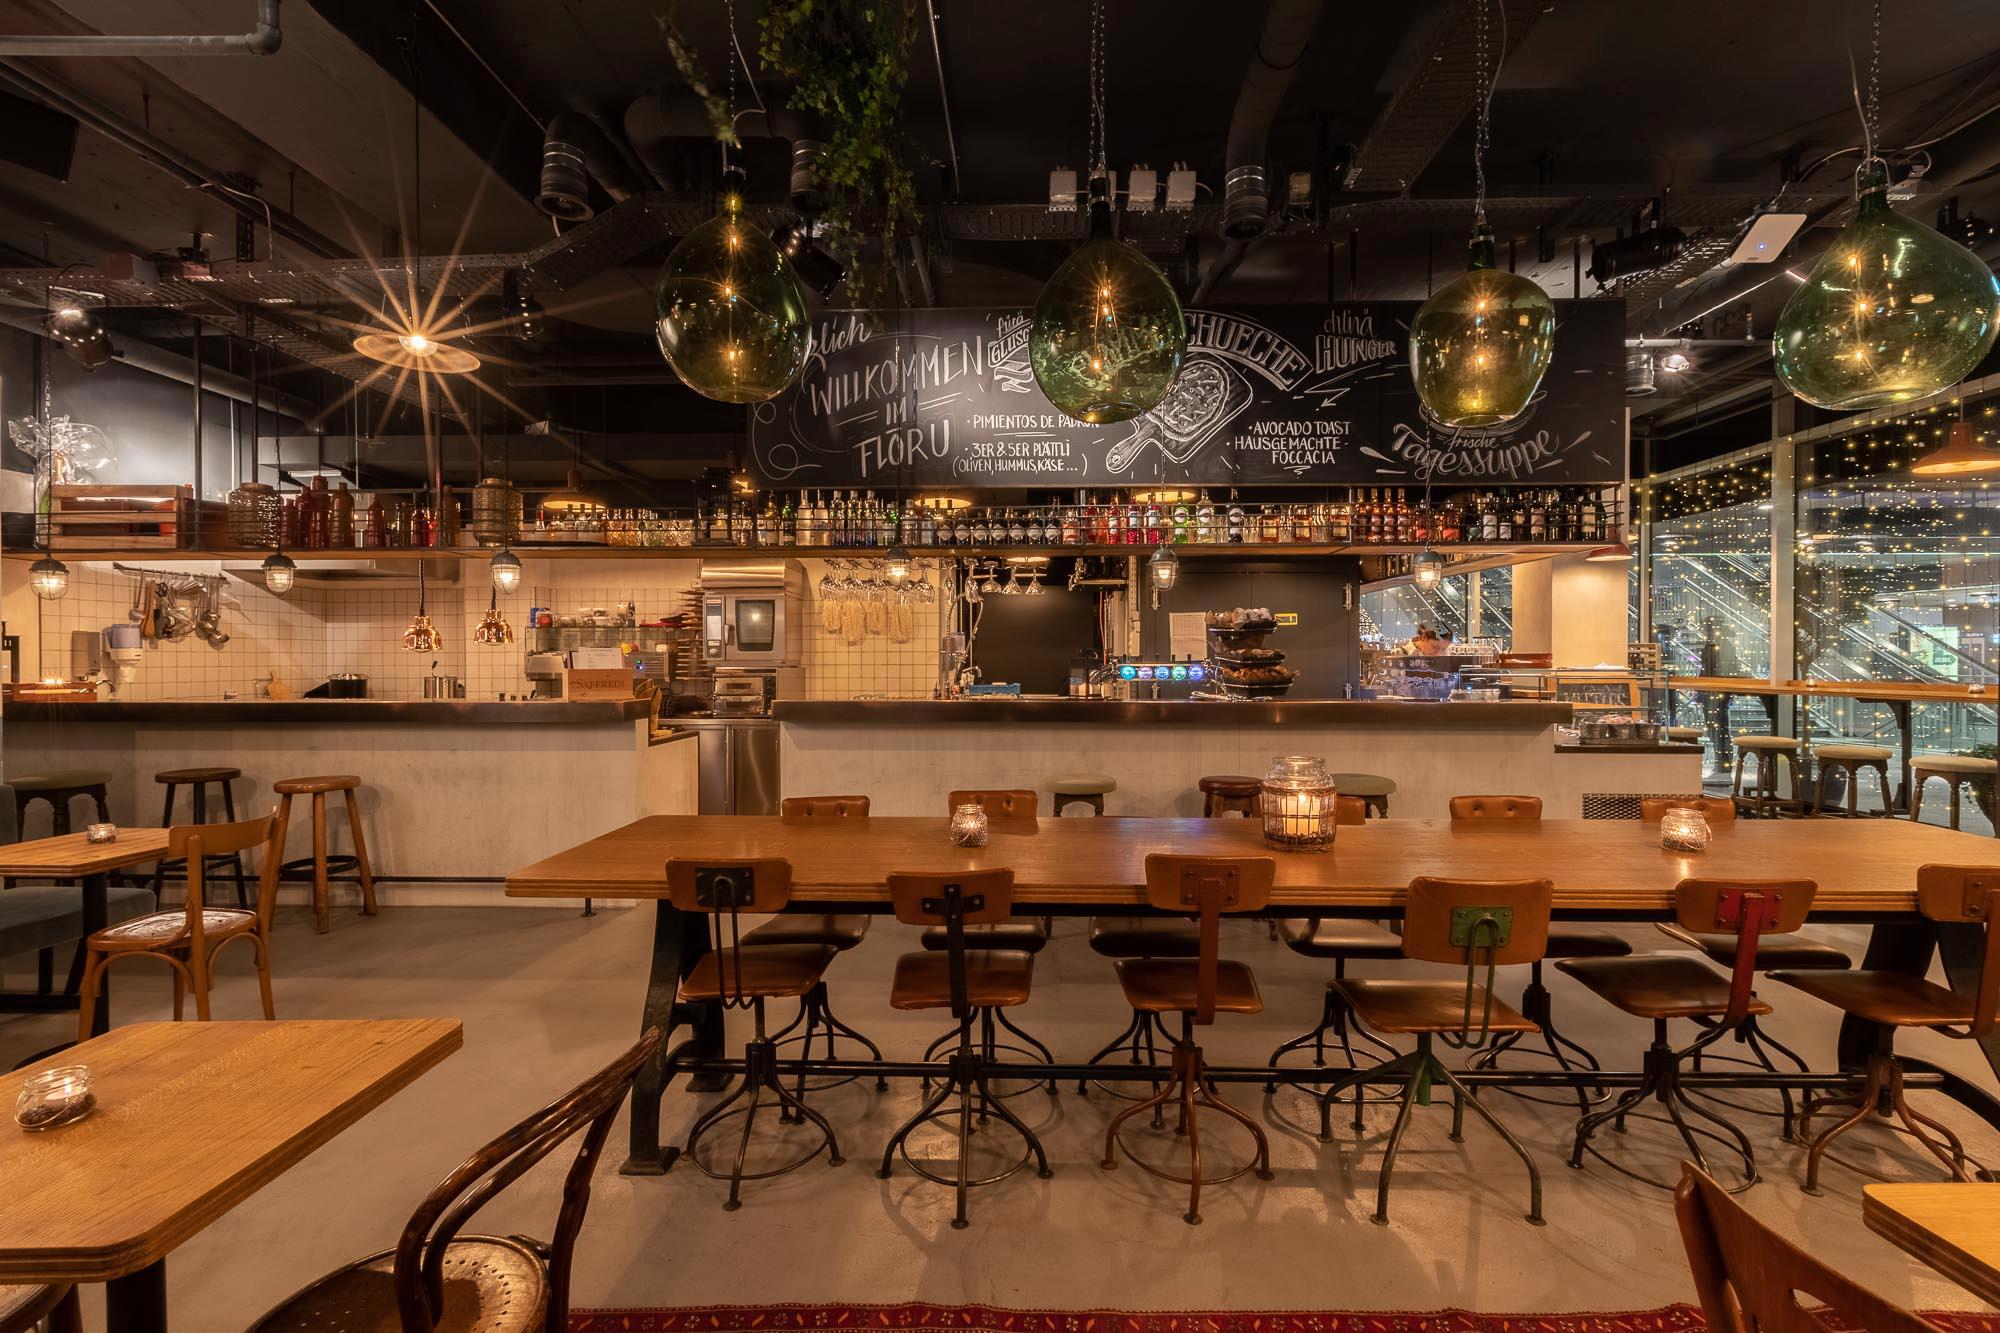 Innenarchitekt_Restaurant_Innen & Architektur_Studer.jpg